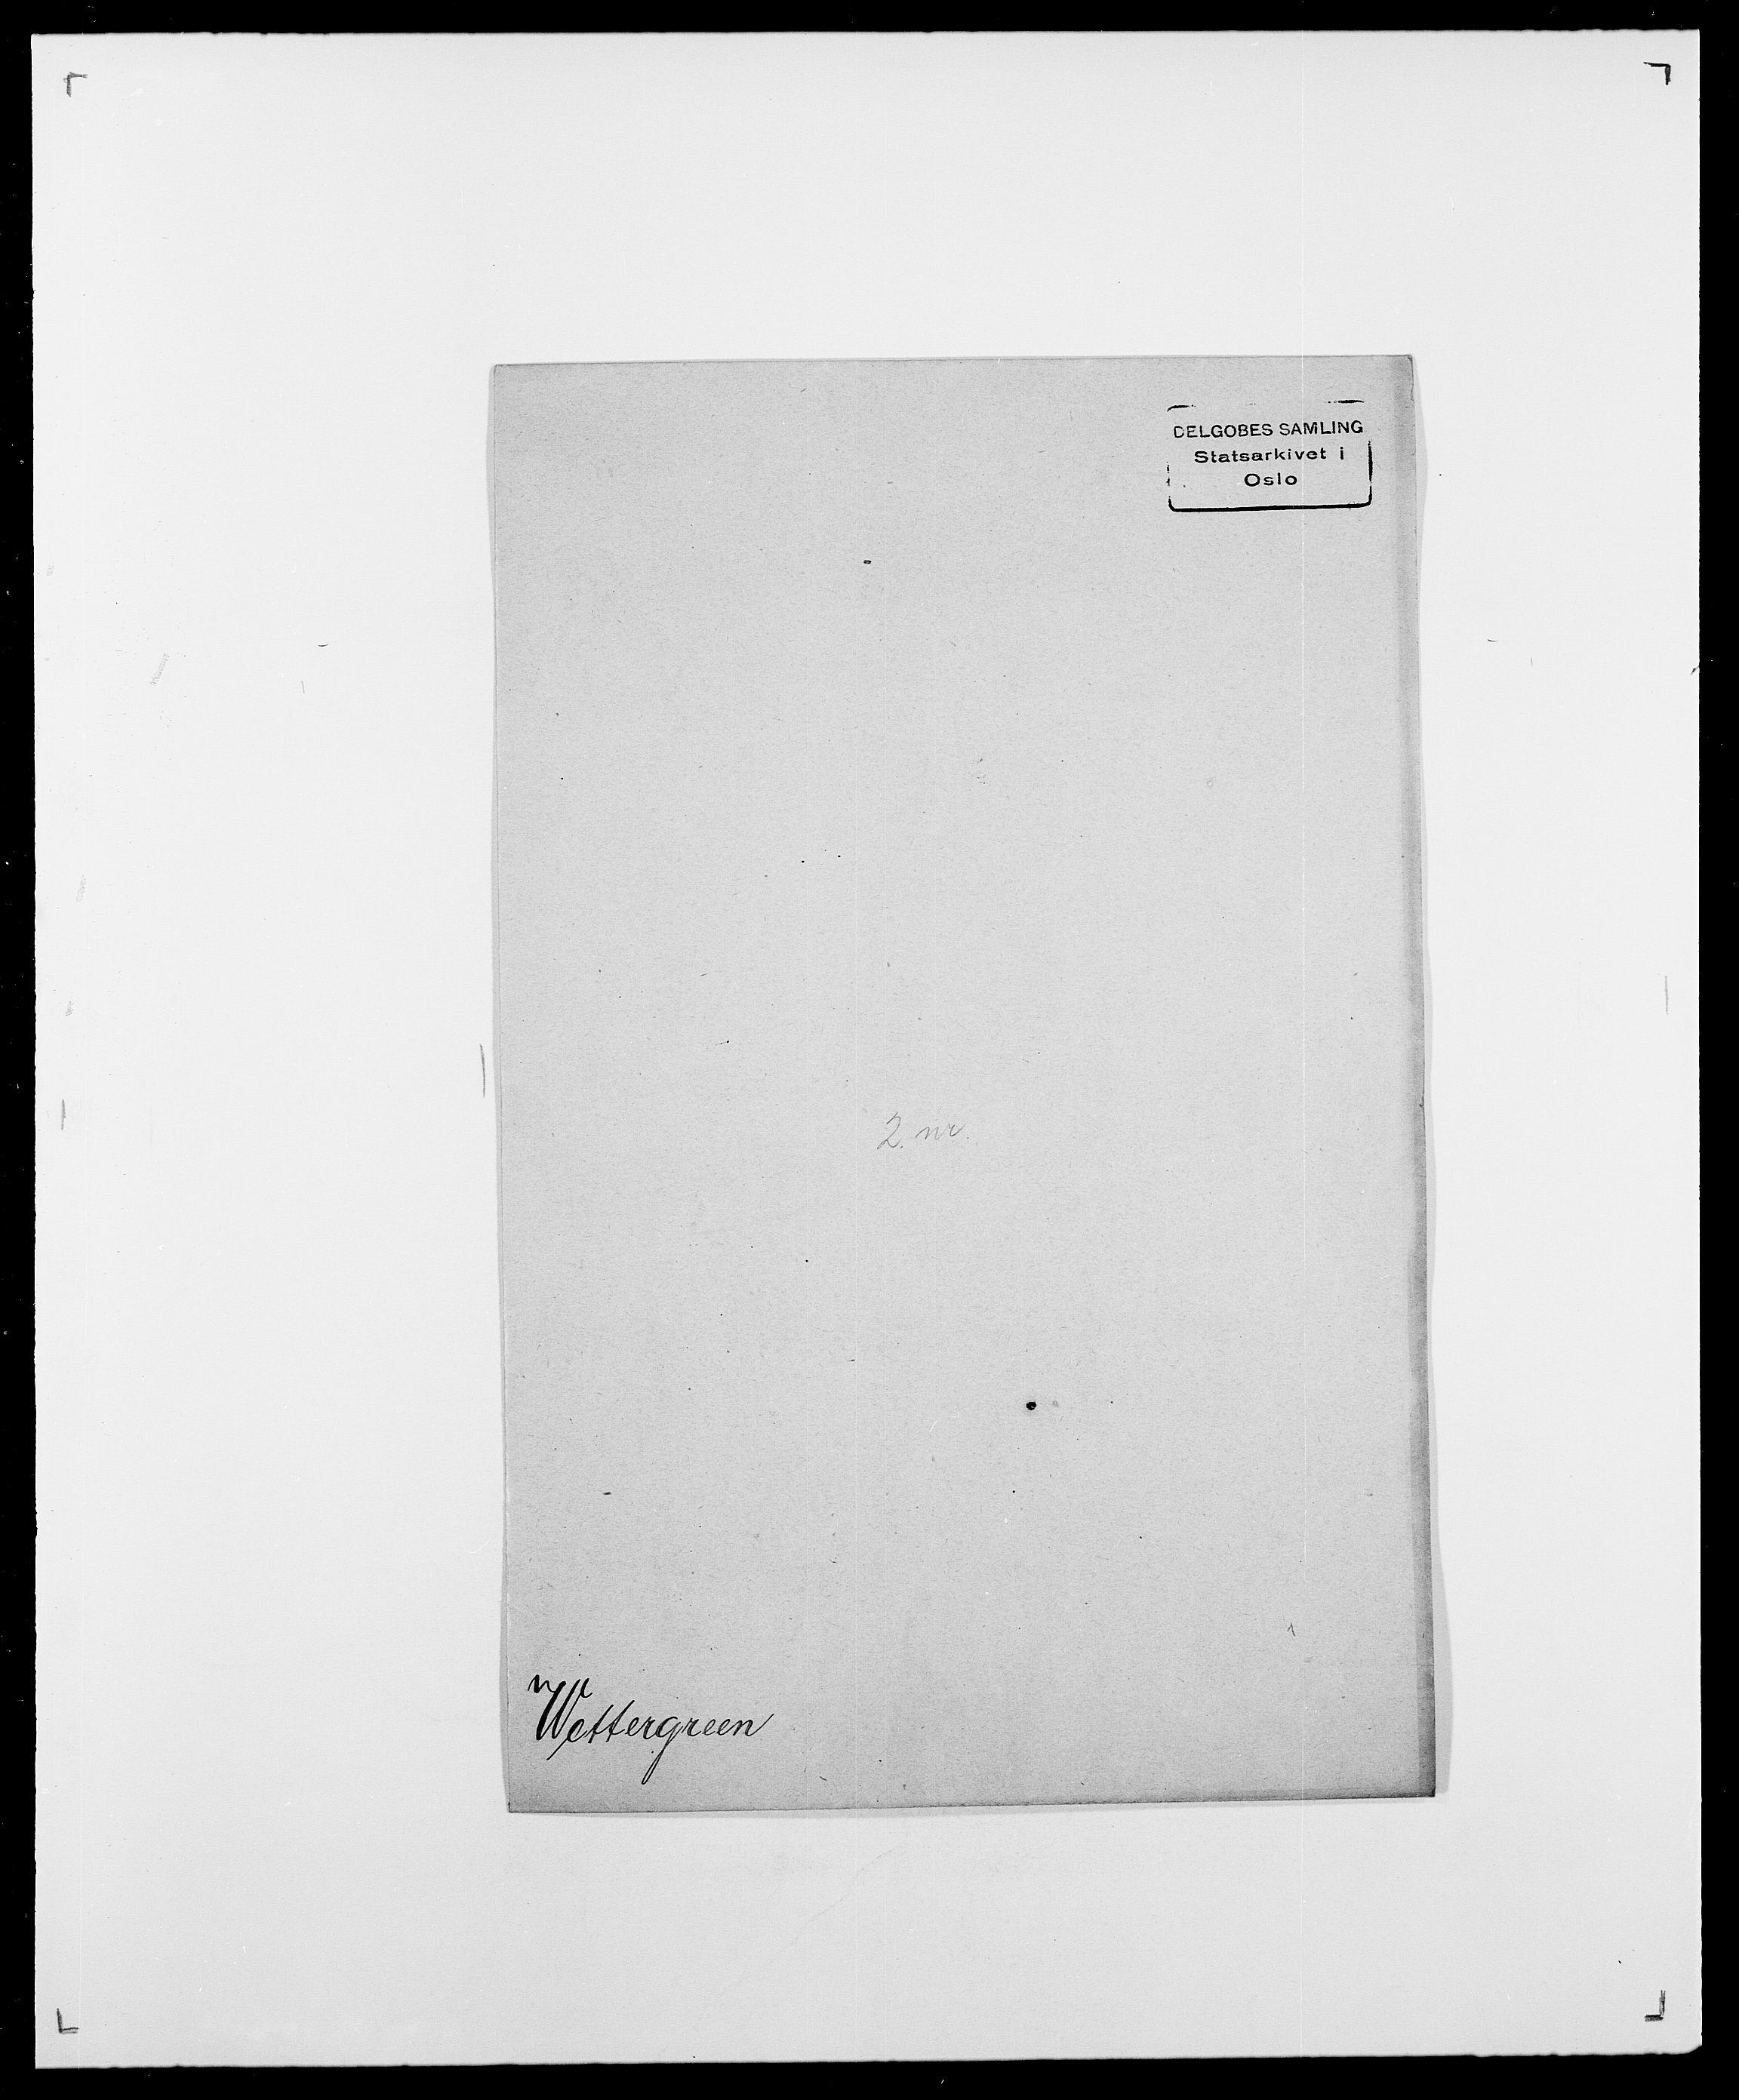 SAO, Delgobe, Charles Antoine - samling, D/Da/L0041: Vemmestad - Viker, s. 345